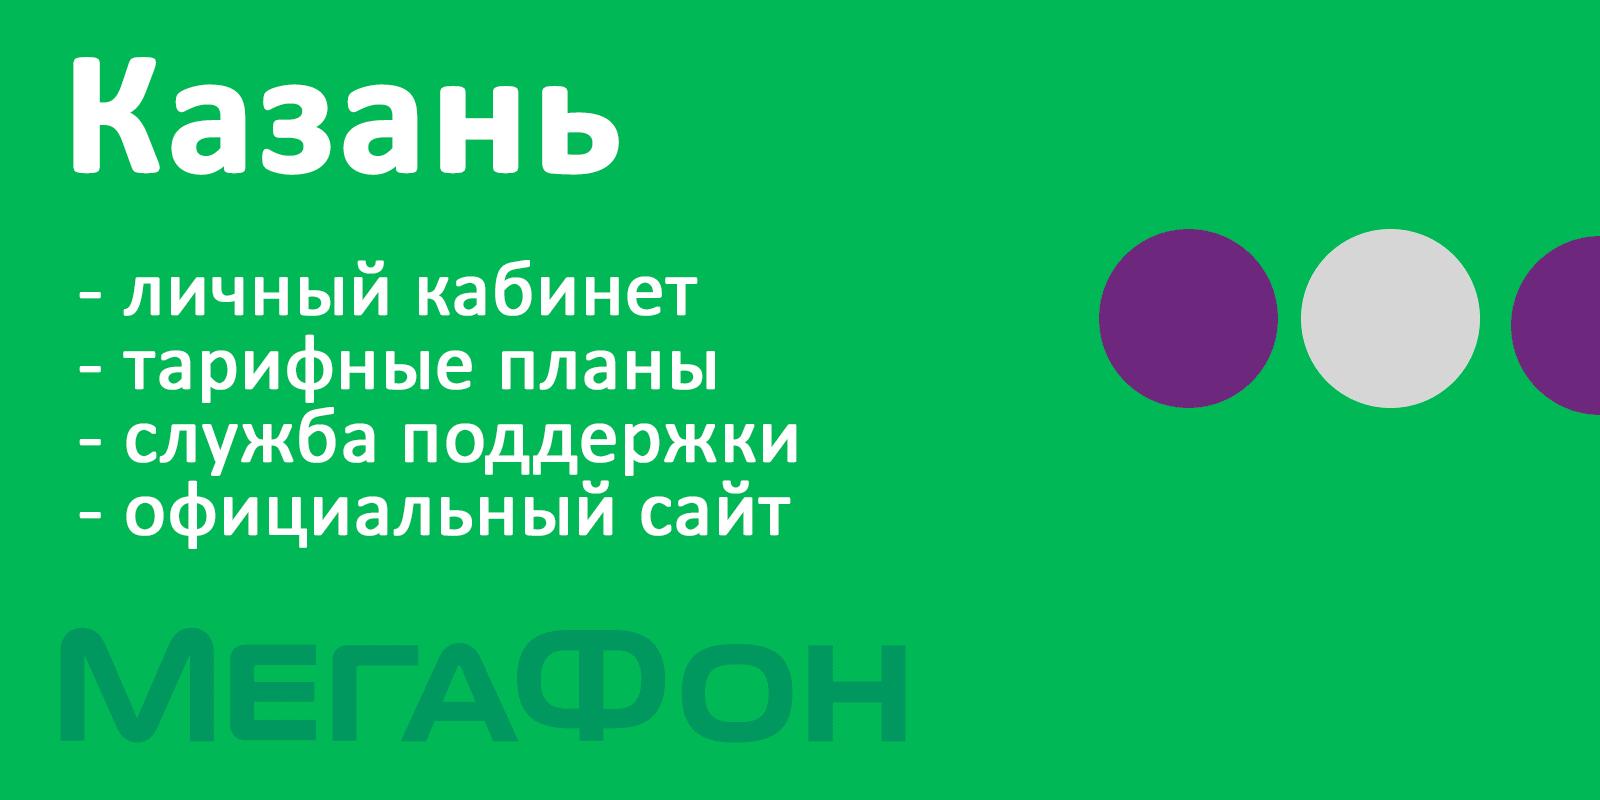 Мегафон Казань - личный кабинет, тарифы, сайт